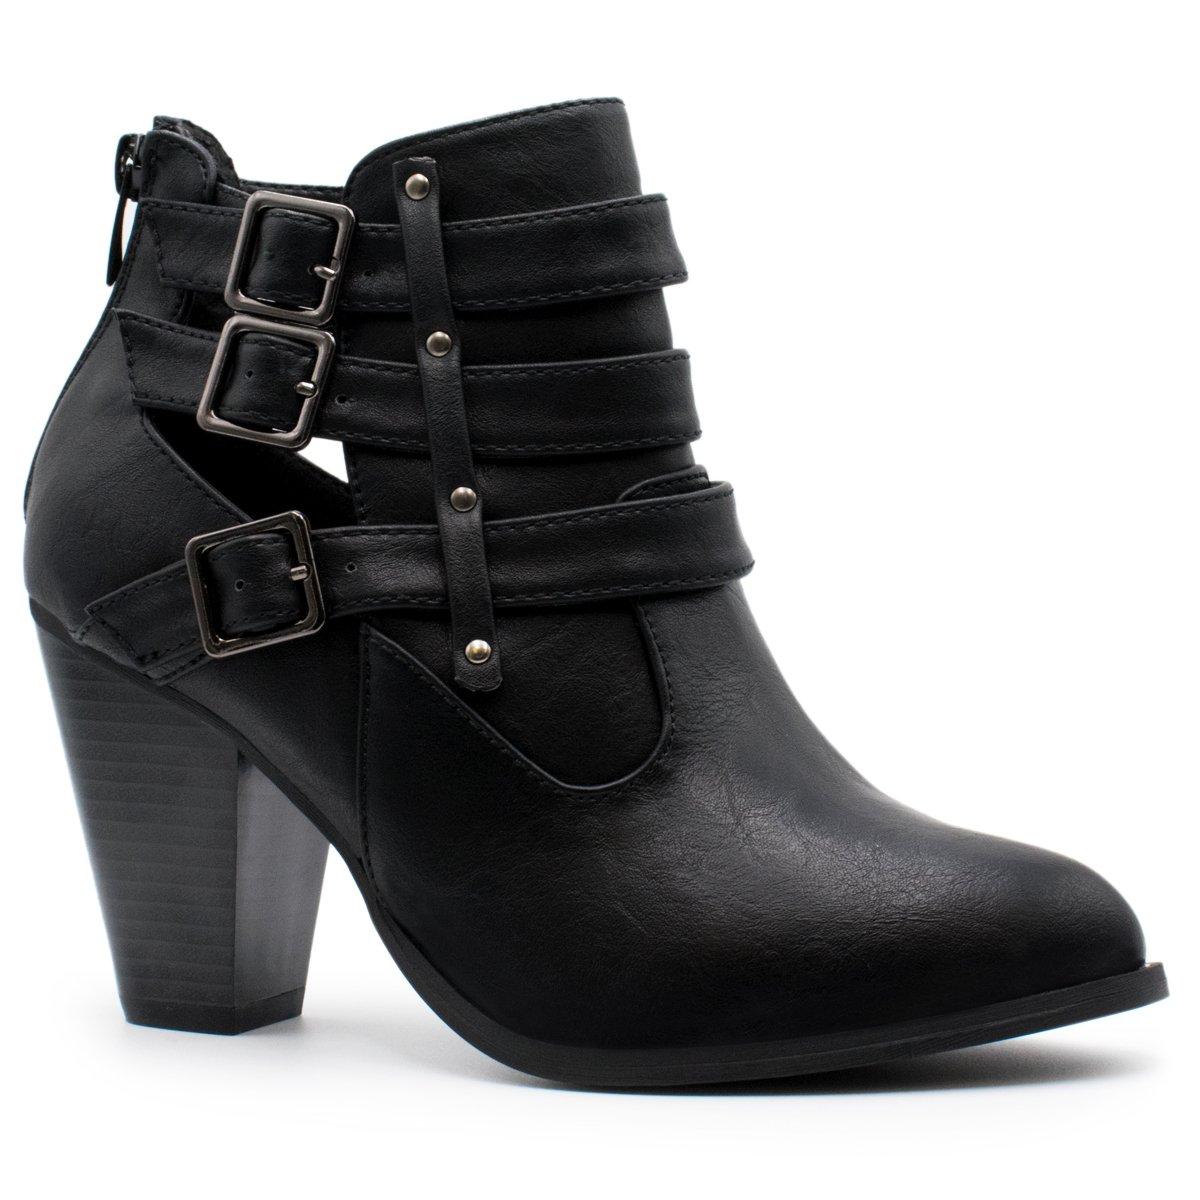 Premier Standard Women's Buckle Strap Block Heel Ankle Booties, TPS Camila-62 v4 Black Size 8.5